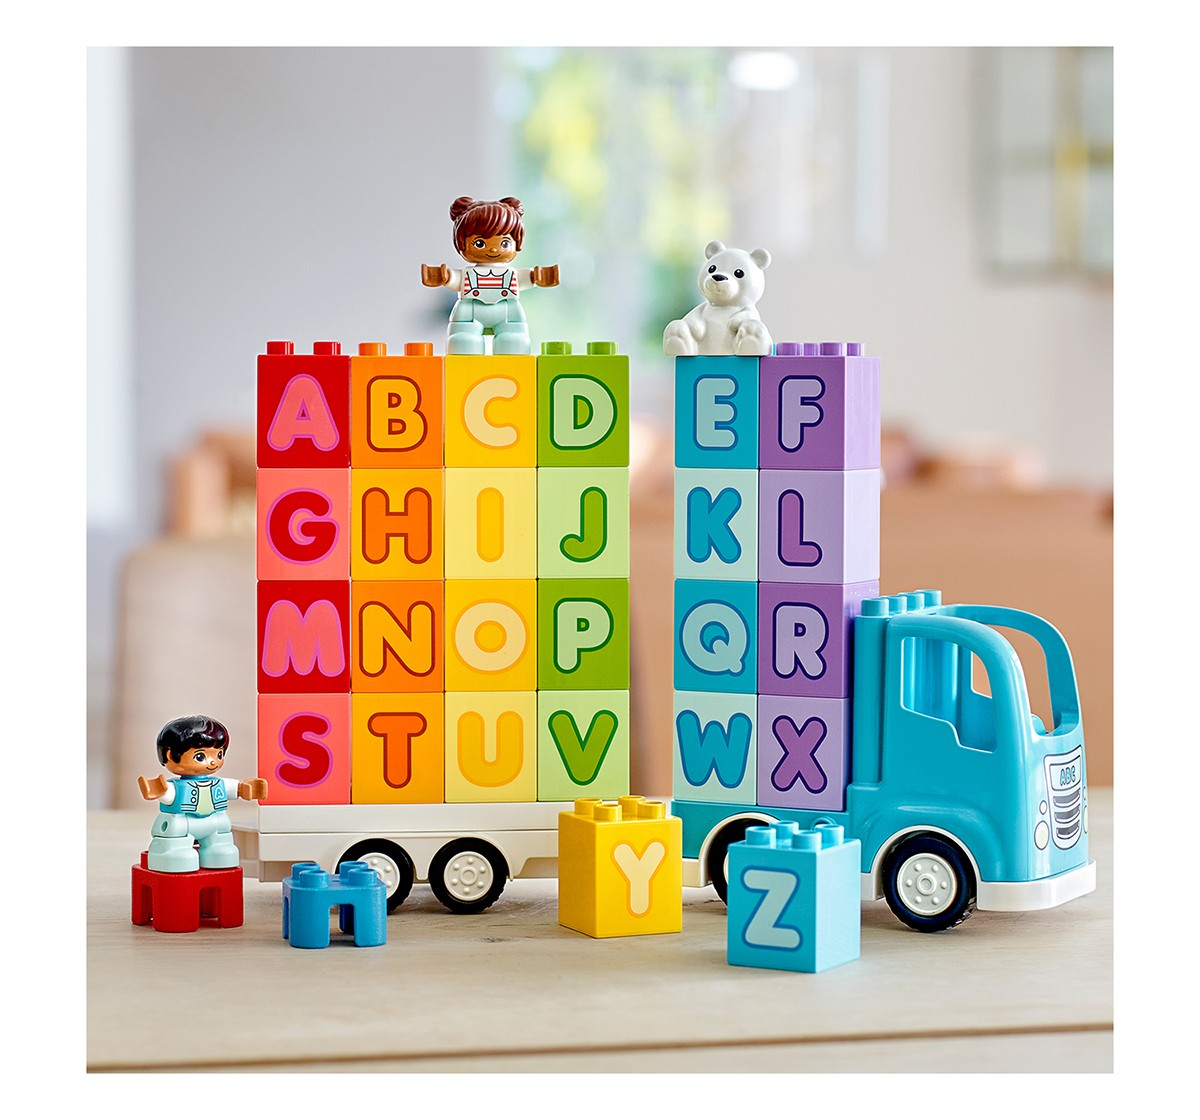 LEGO 10915 Alphabet Truck Lego Blocks for Kids age 18M +